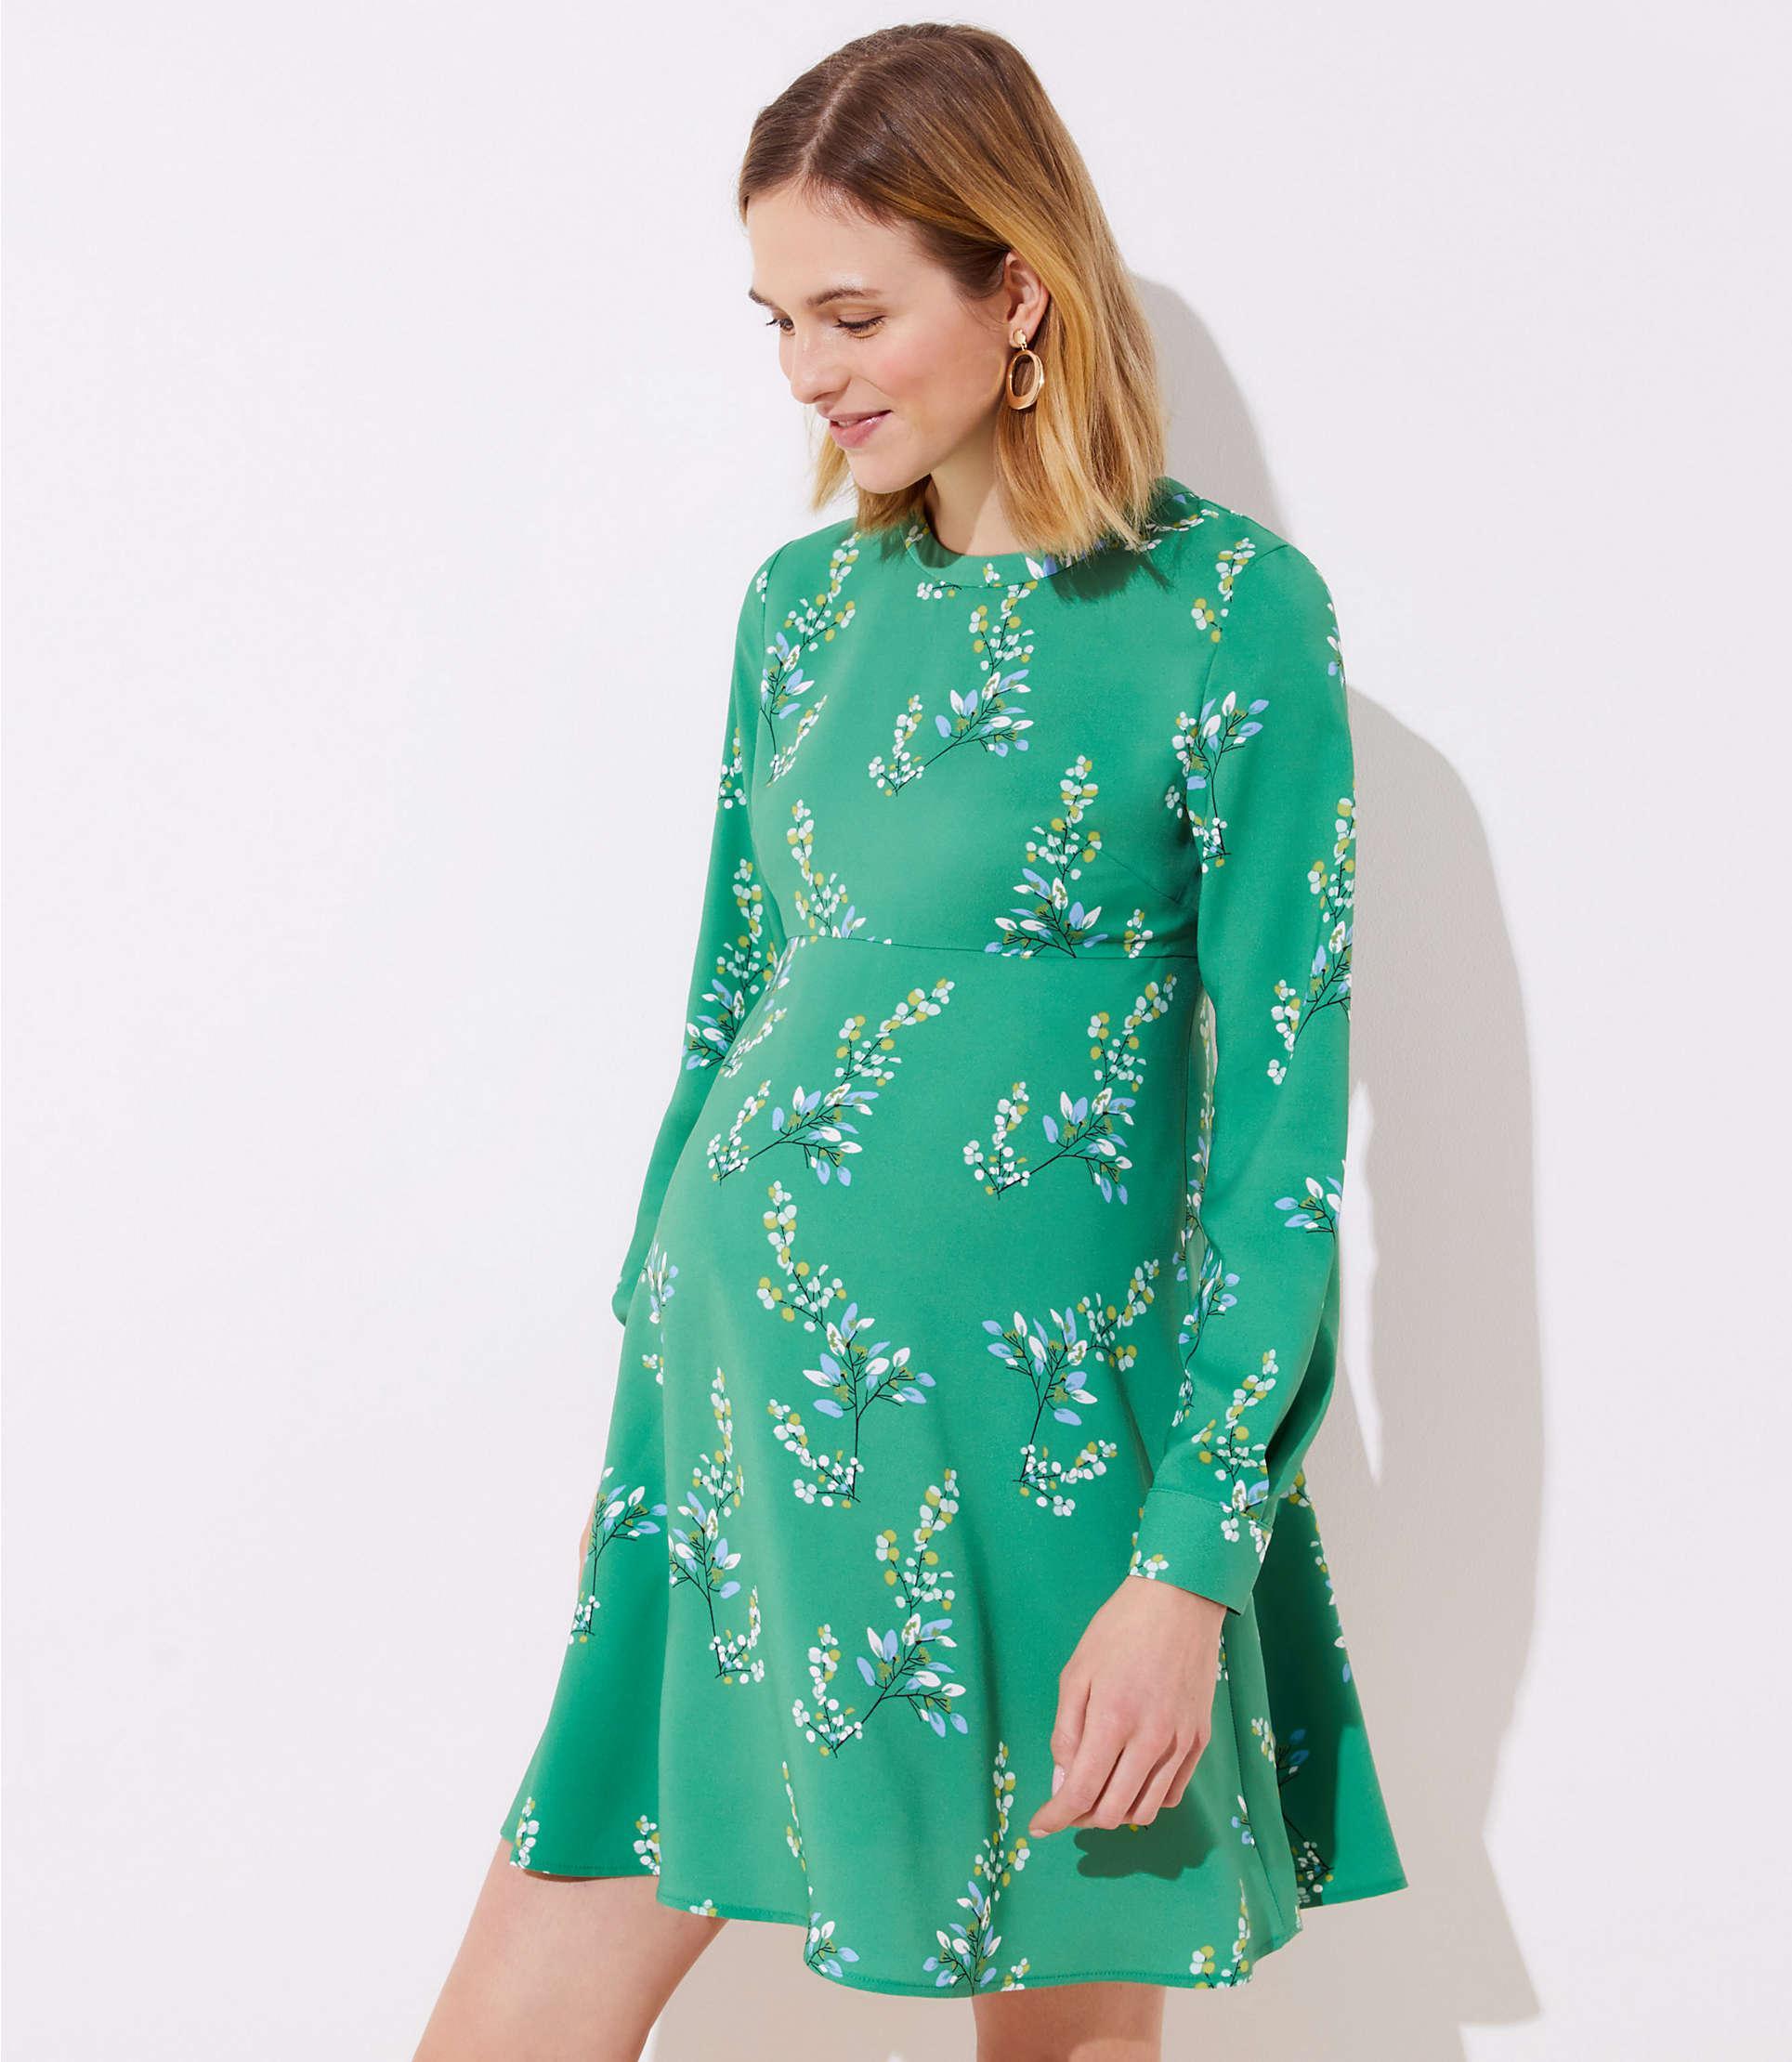 552ebfad LOFT - Green Maternity Flower Branch Flare Shirtdress - Lyst. View  fullscreen